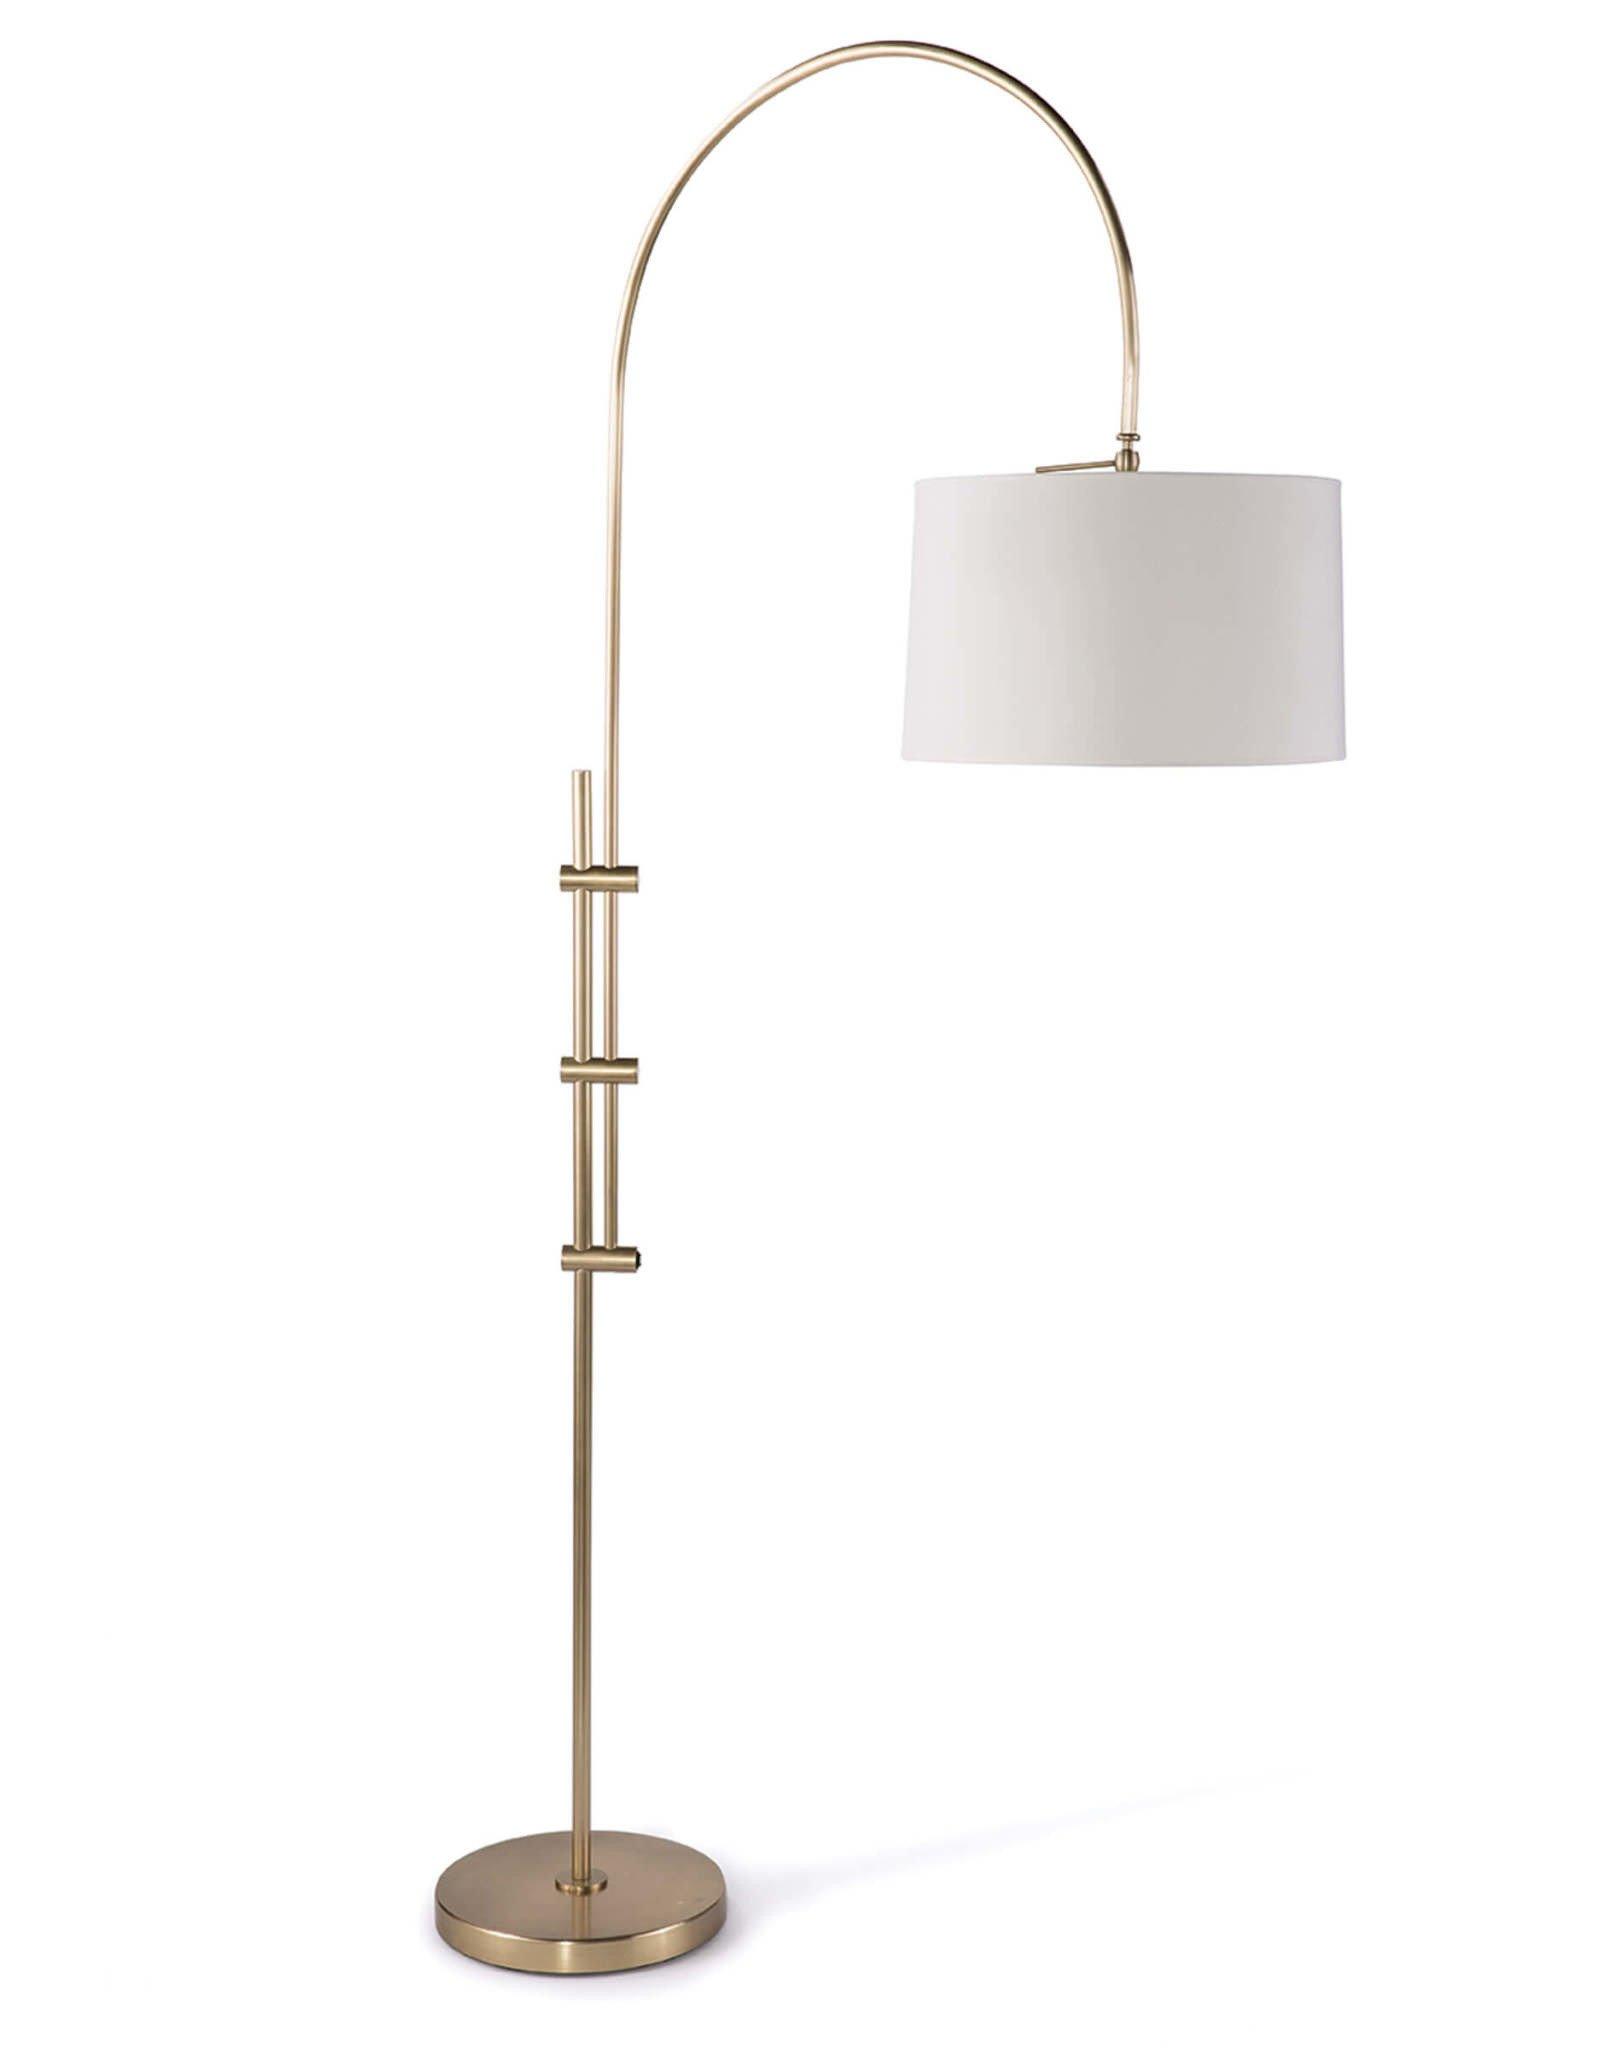 Regina Andrew Design Arc Floor Lamp With Fabric Shade (Natural Brass)